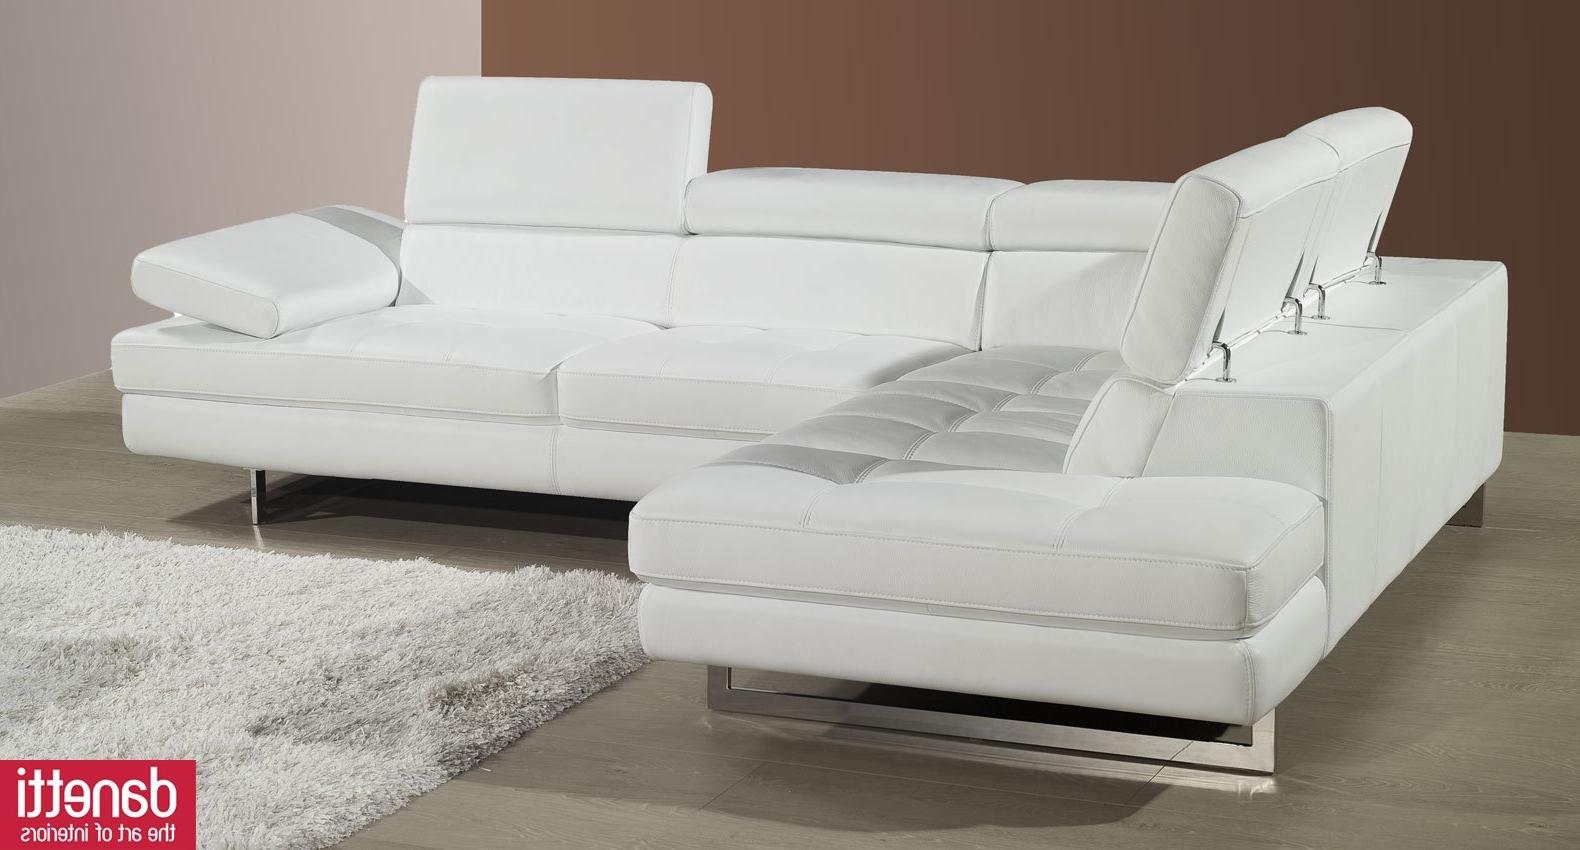 White Leather Sofas With Regard To Famous Modern White Leather Sofa Set Tags : Modern White Leather Sofa (View 8 of 15)